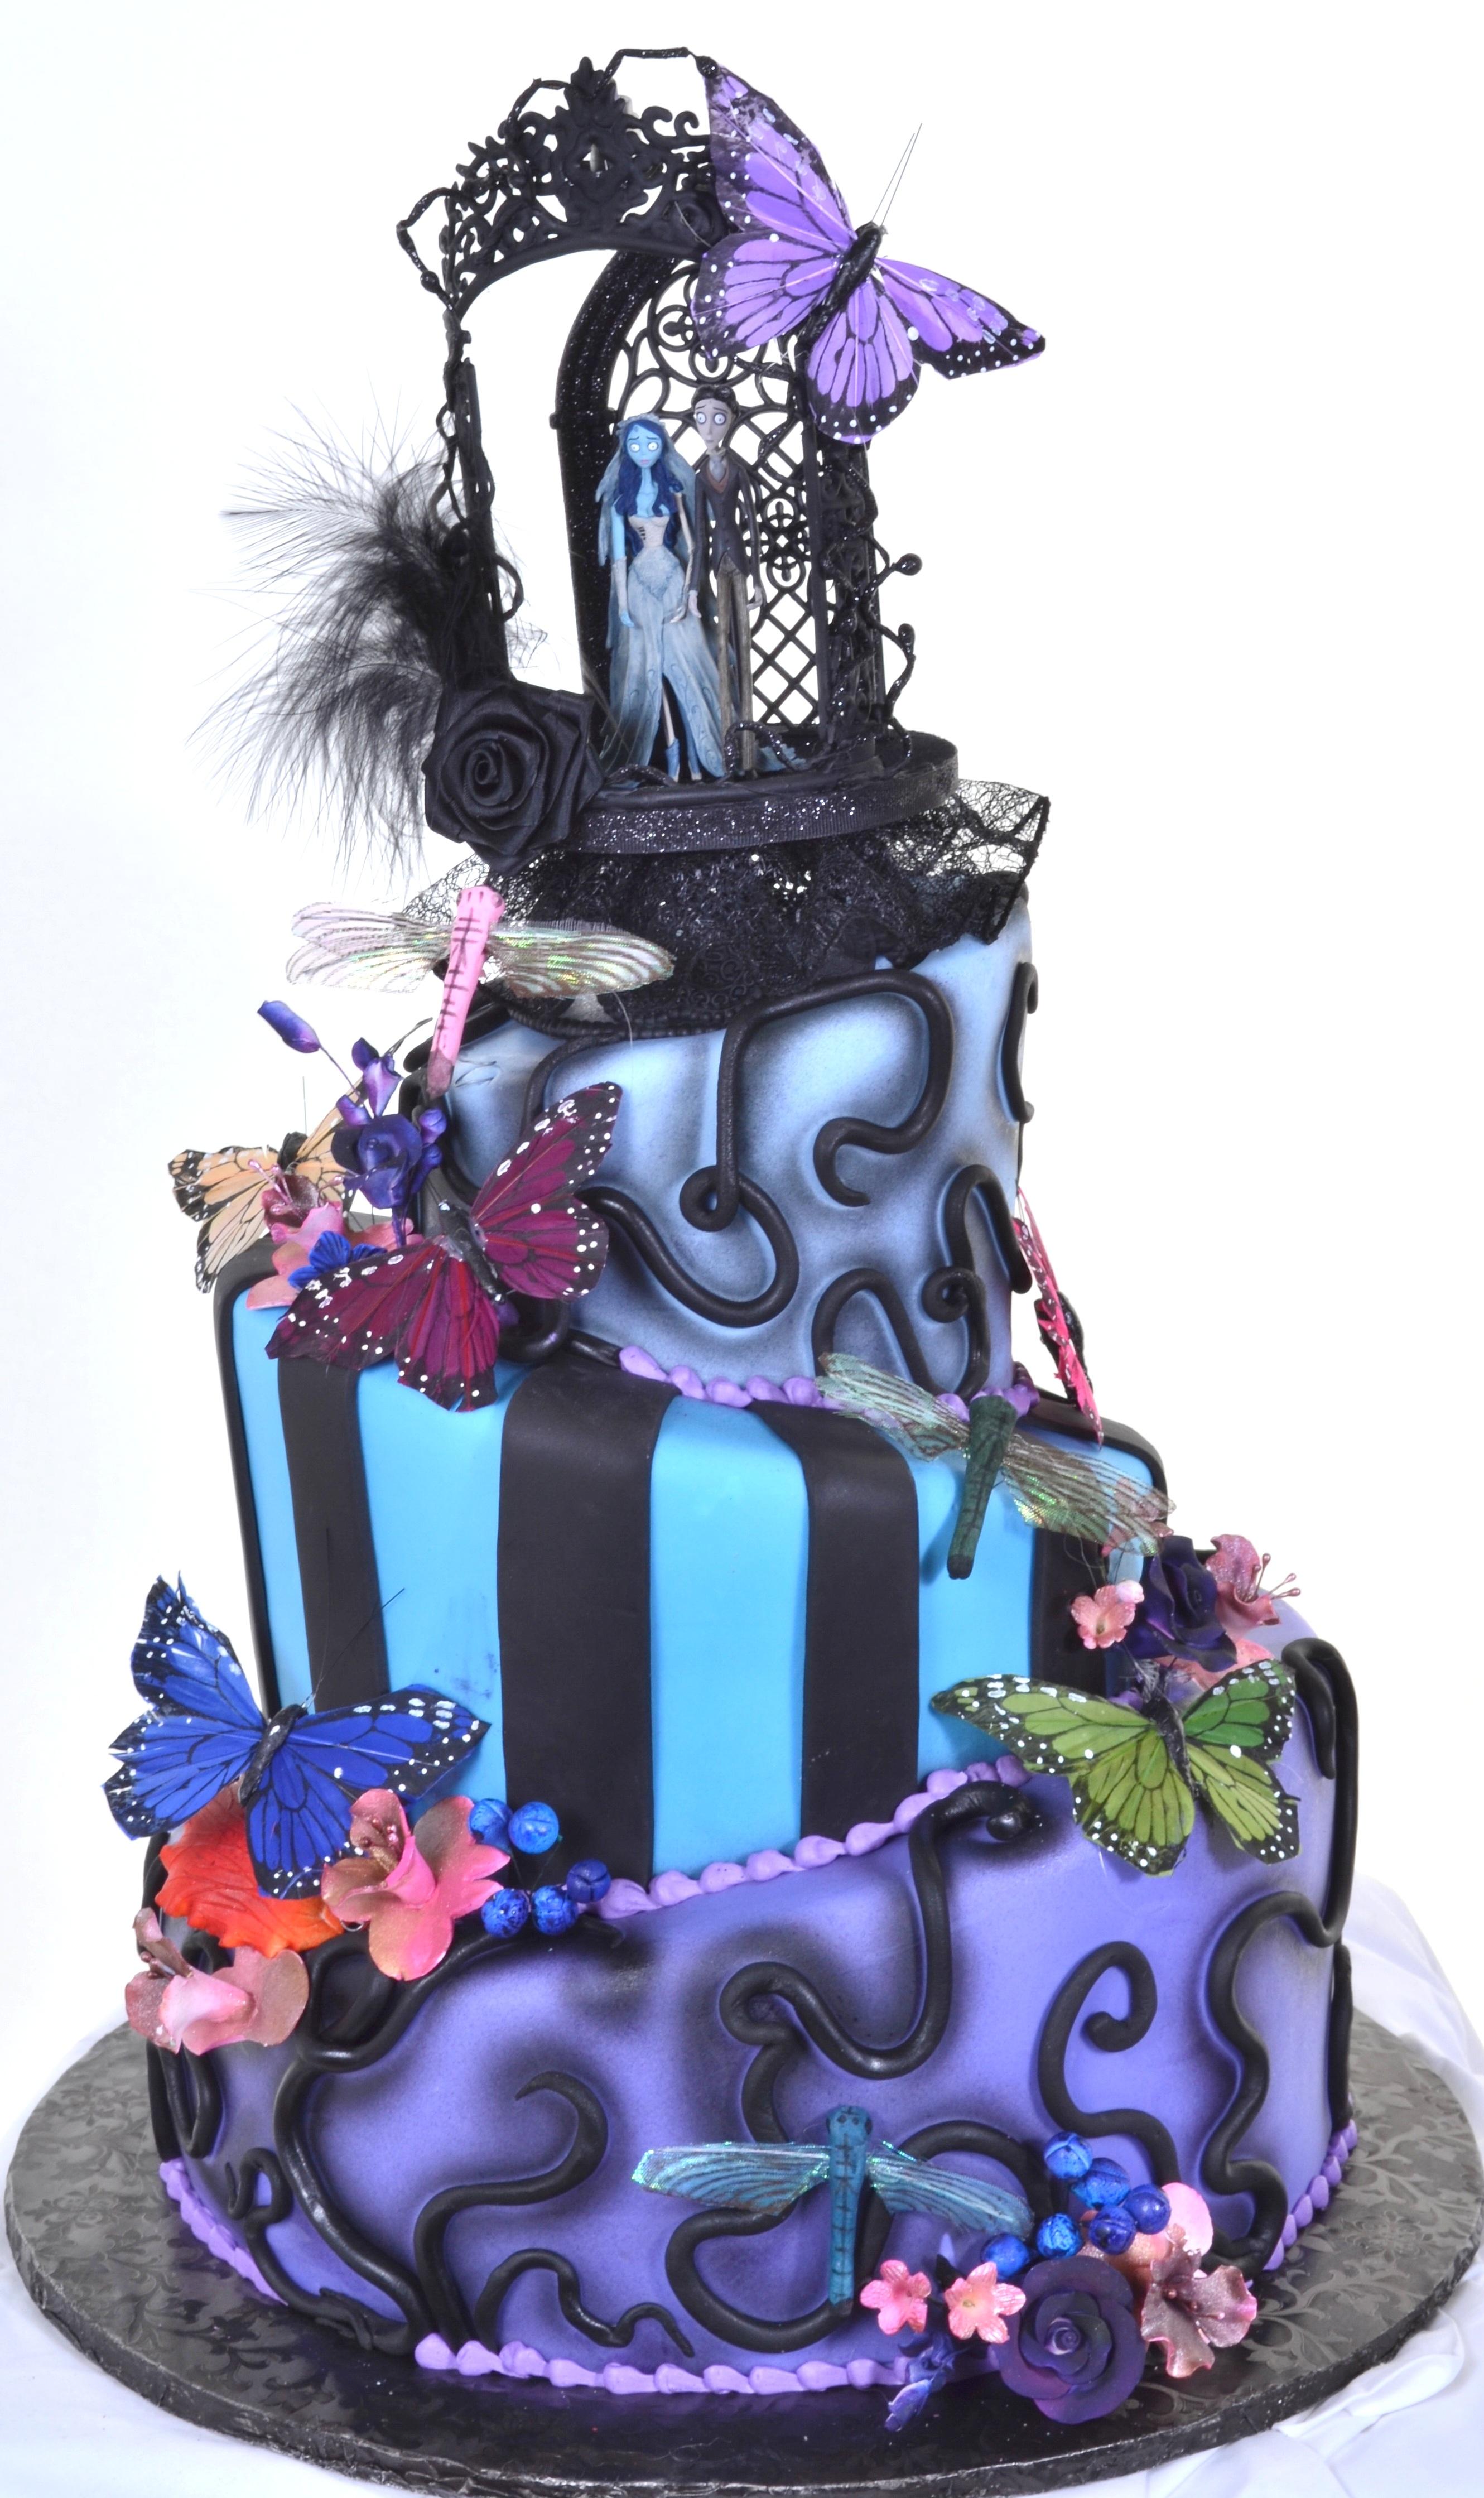 Pastry Palace Las Vegas - Wedding Cake 86 - Spooktacular